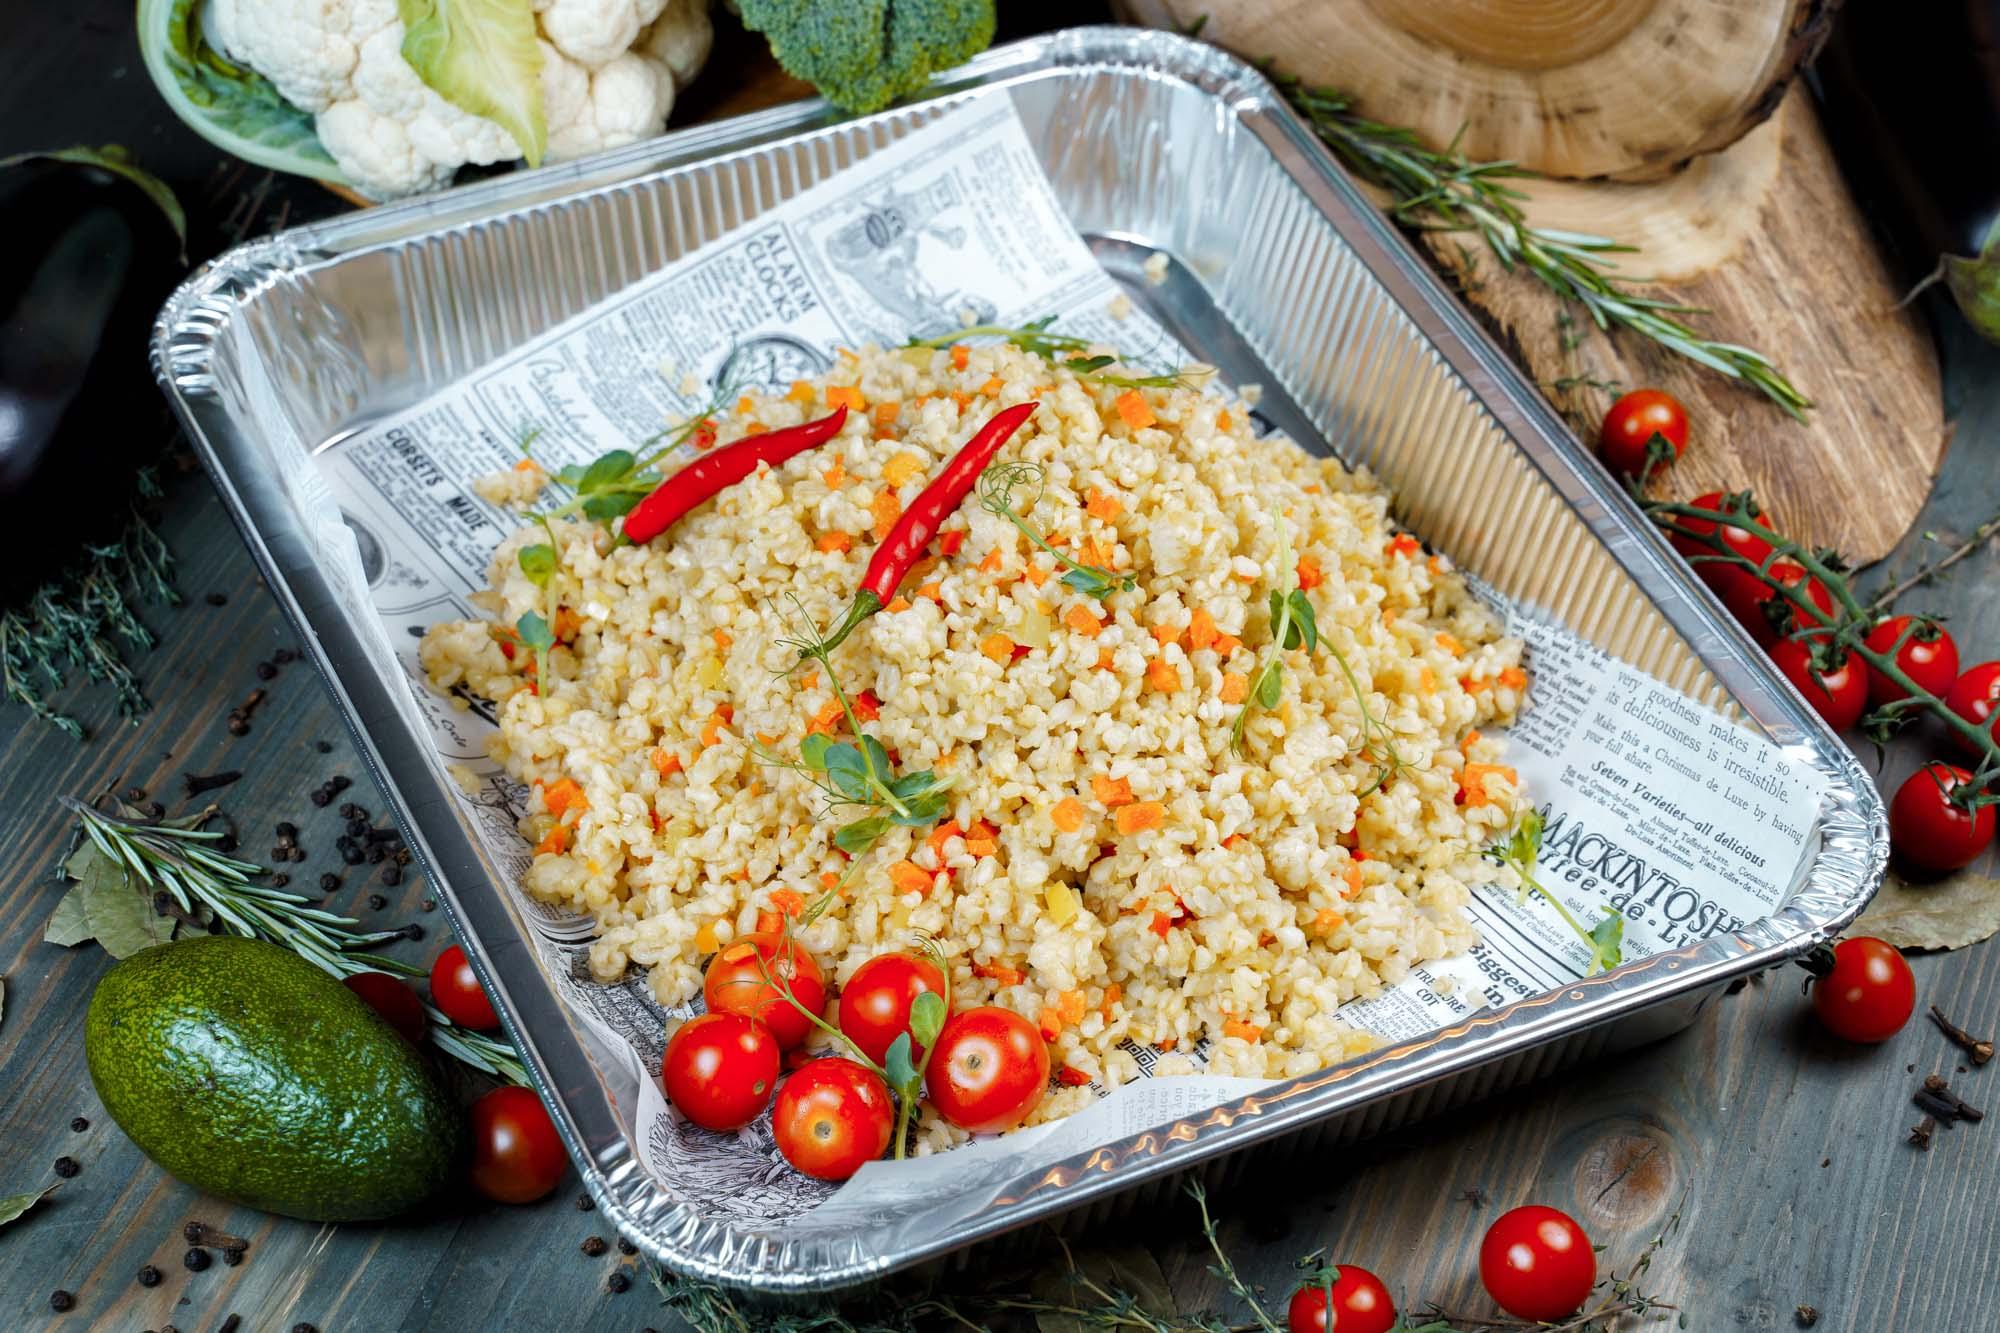 Булгур с овощами 1800 гр (12 порций по 150 гр)